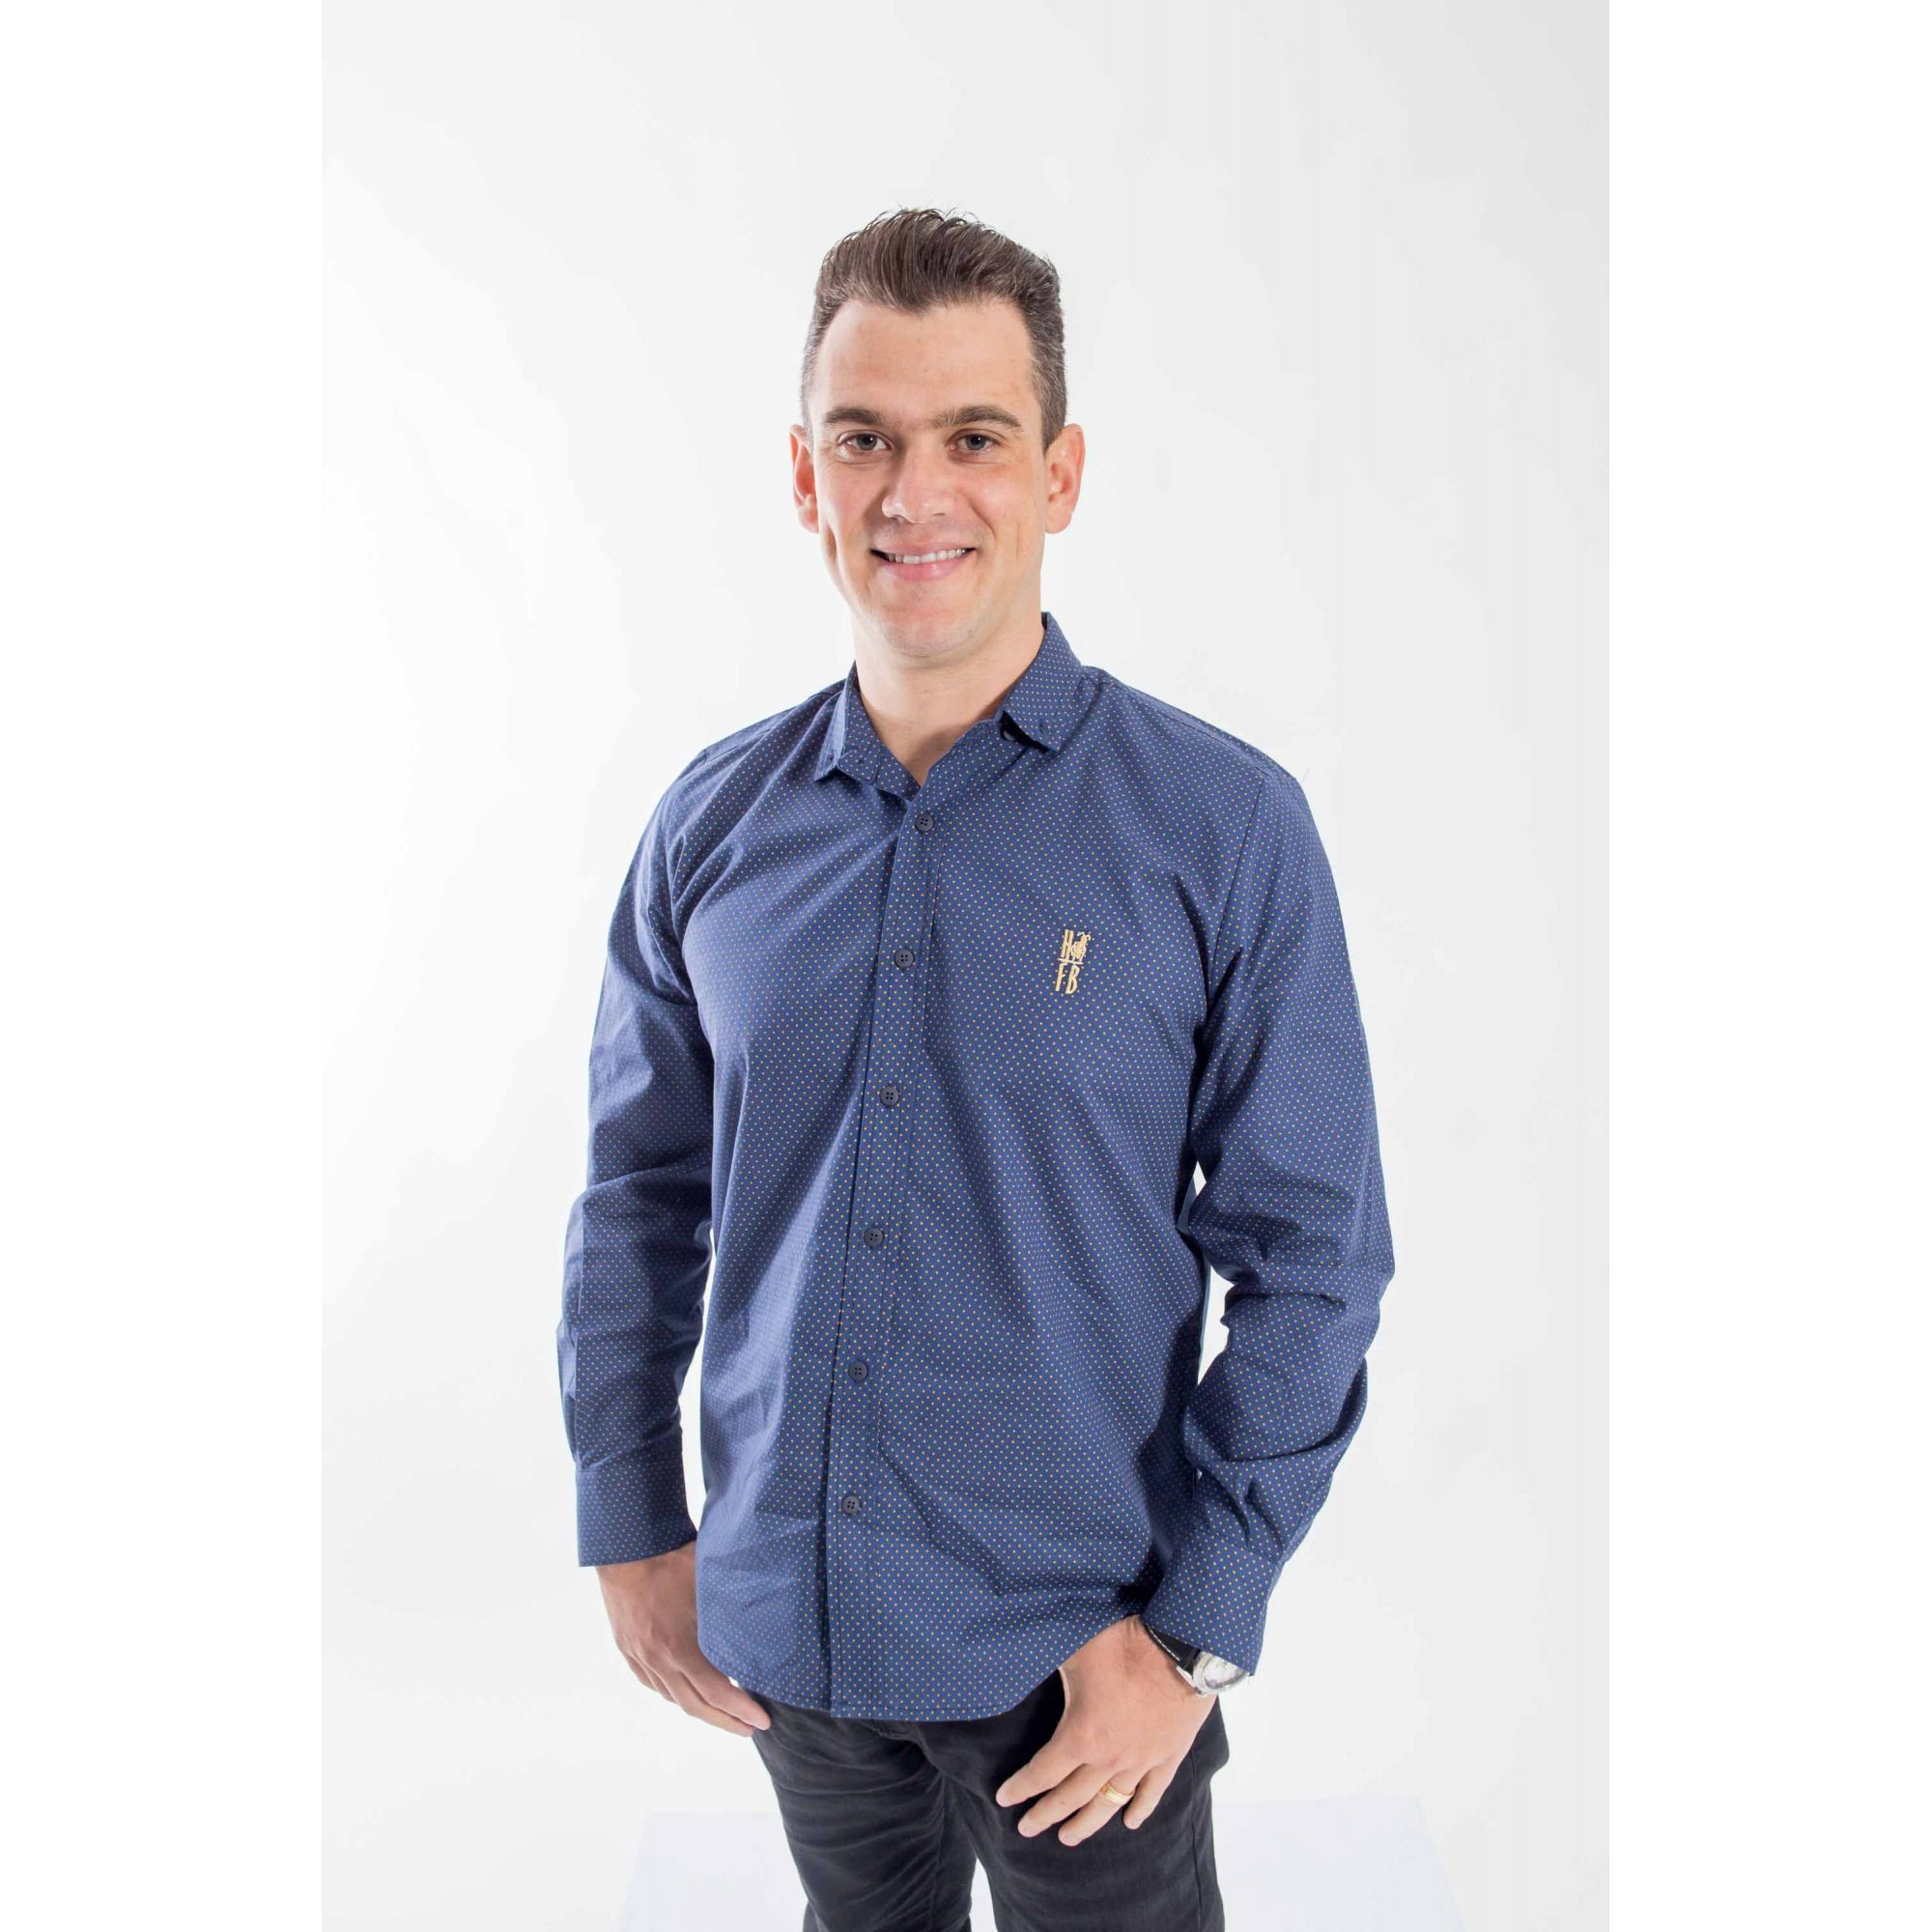 Camisa Social Steven Seagal Azul Marinho Adulta  - Heitor Fashion Brazil